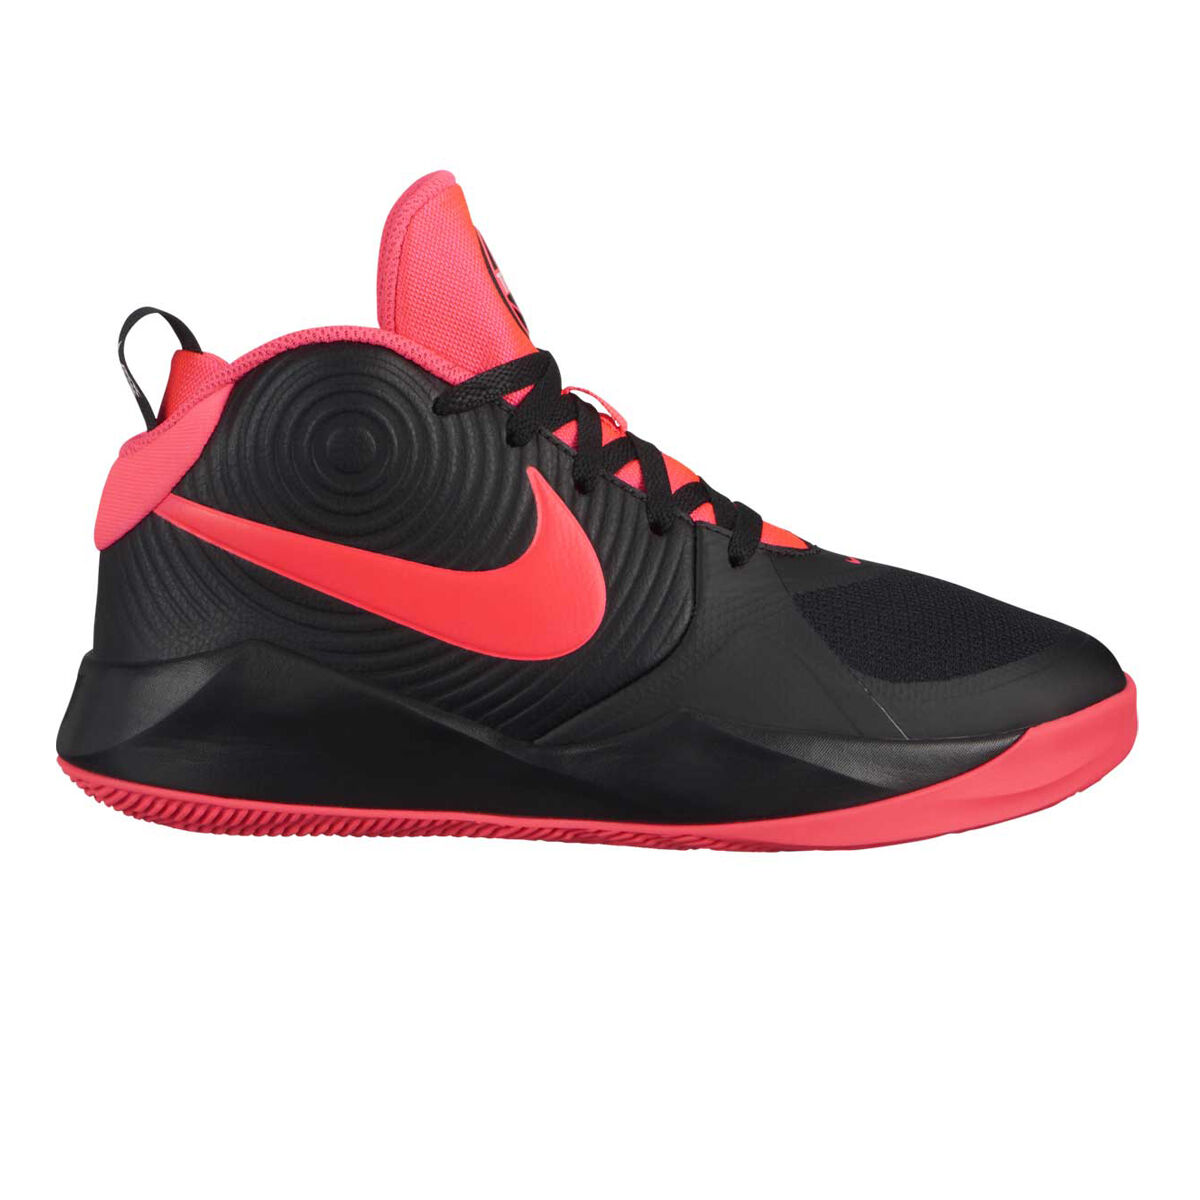 9 Basketball ShoesRebel Team Hustle D Kids Sport Nike MpGLqVSjUz